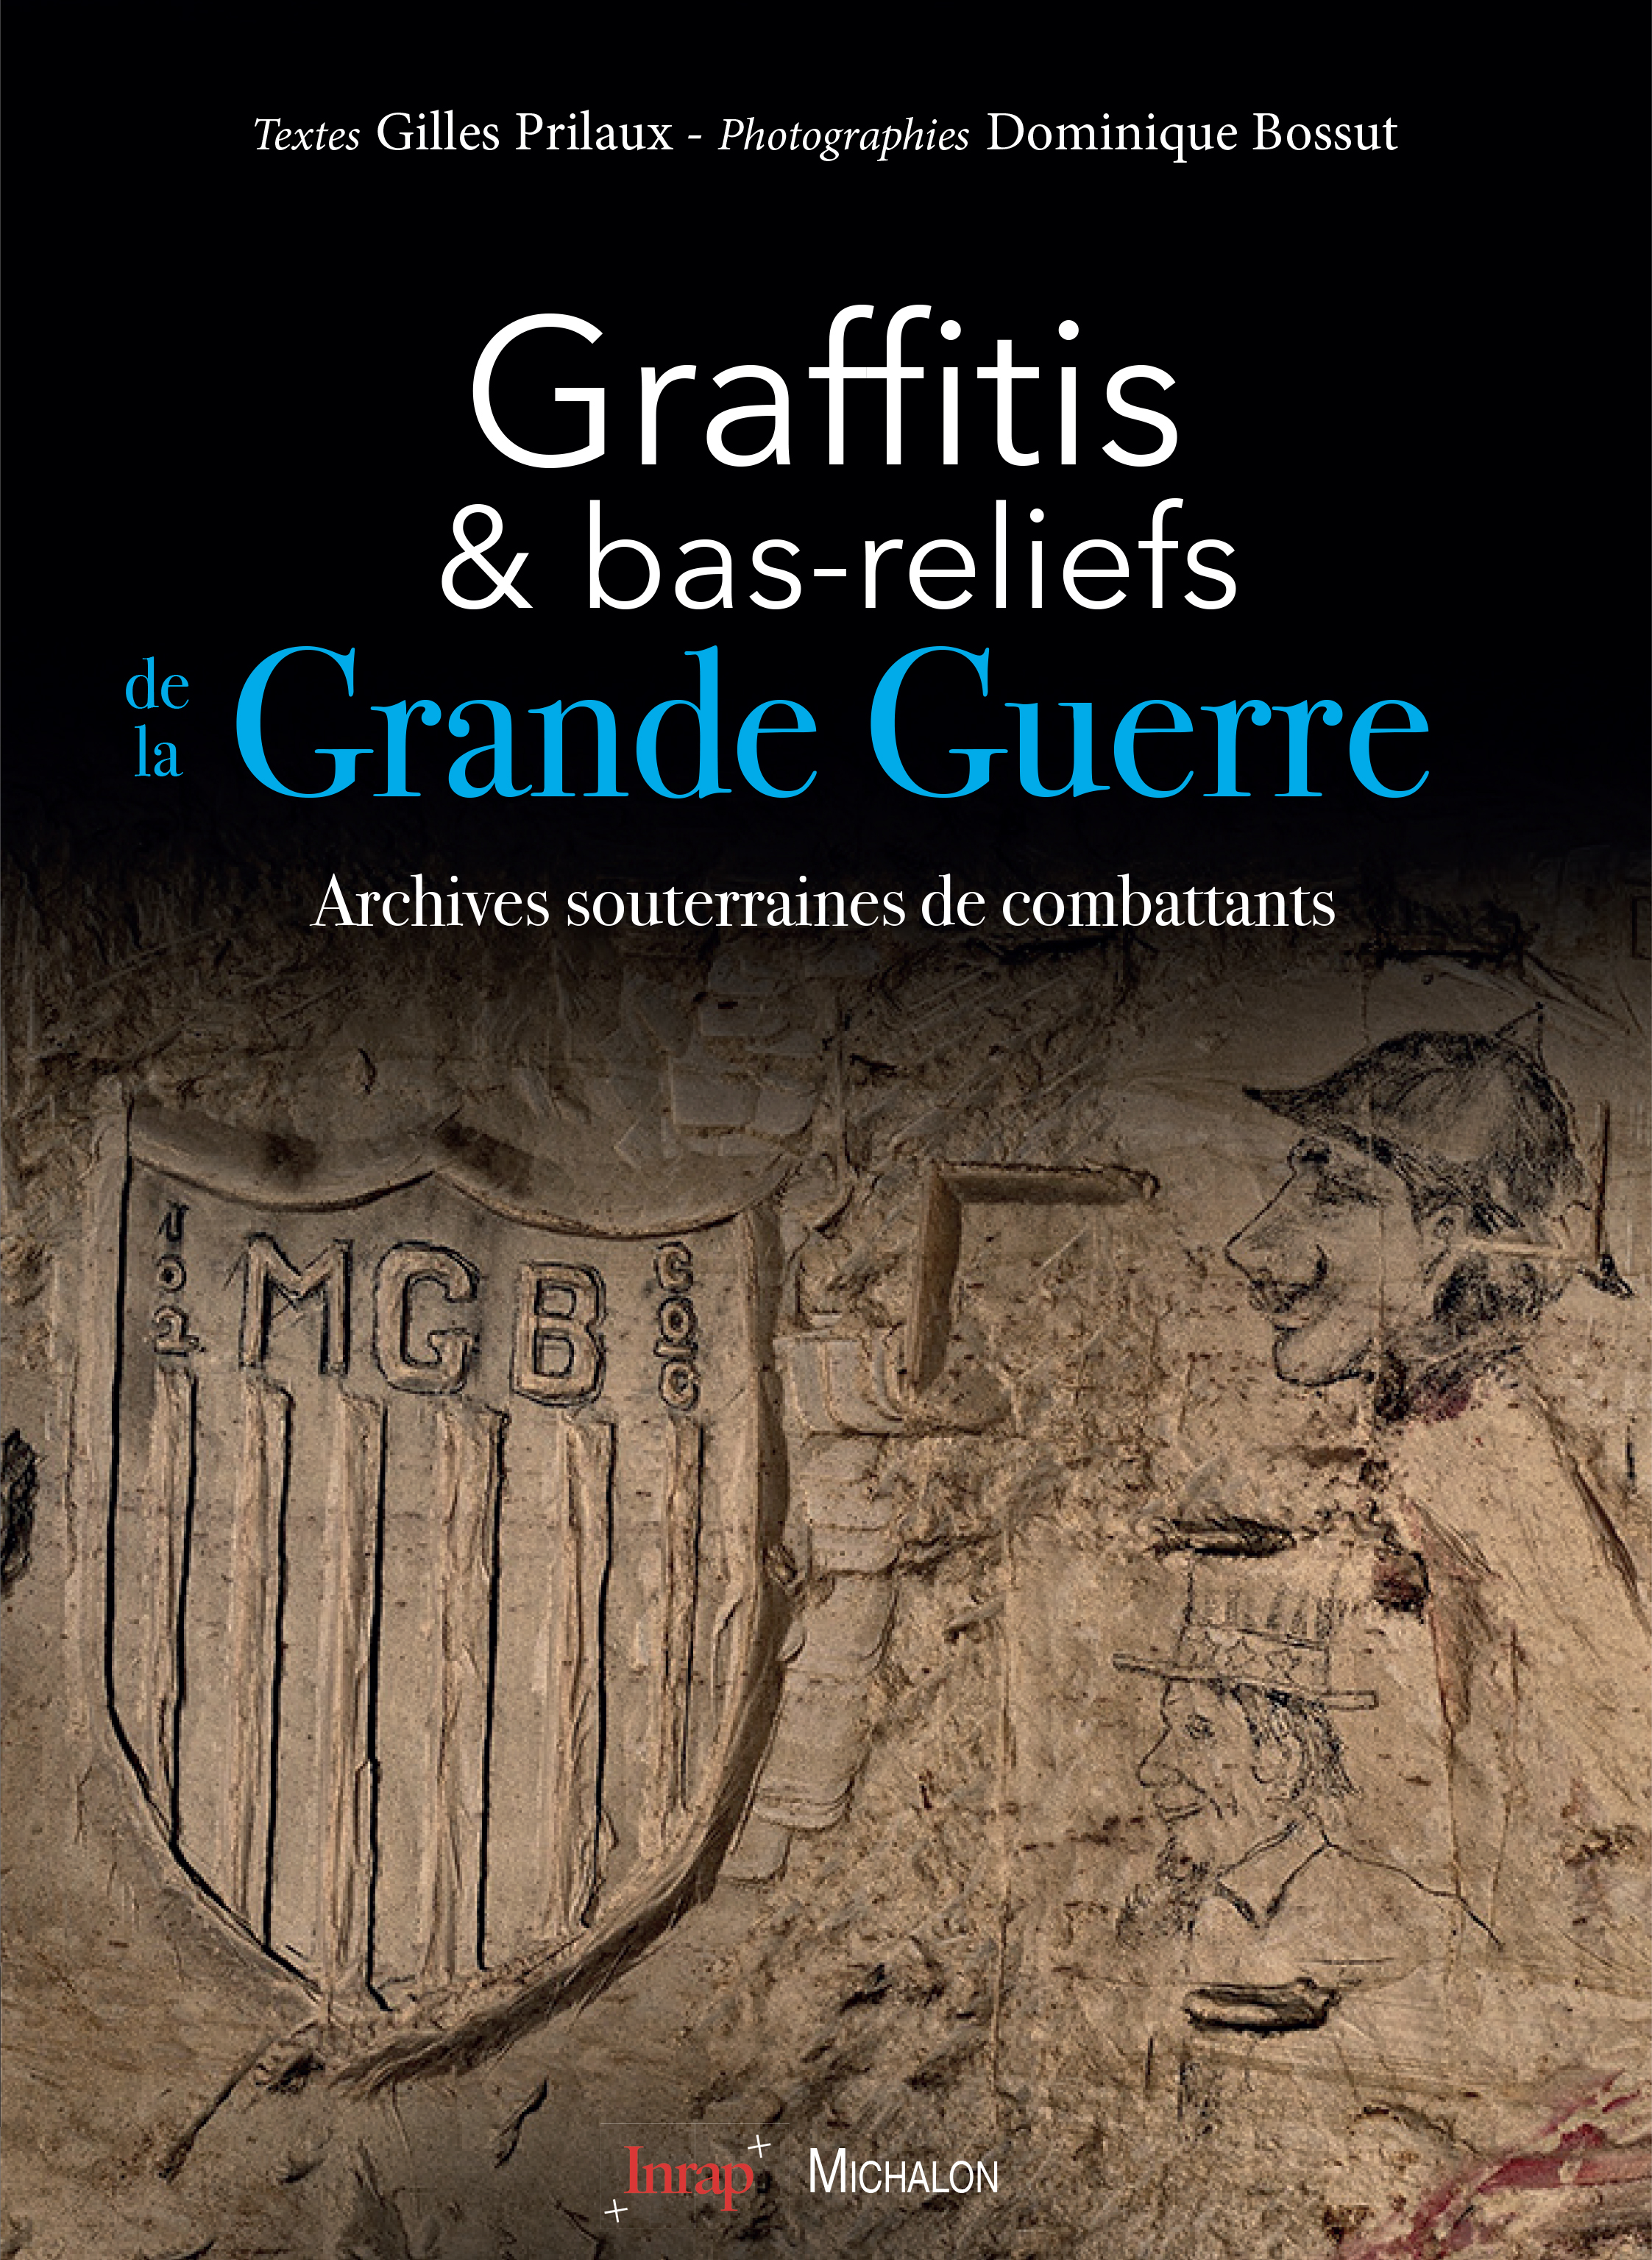 Graffitis-grande-guerre_couverture.jpg